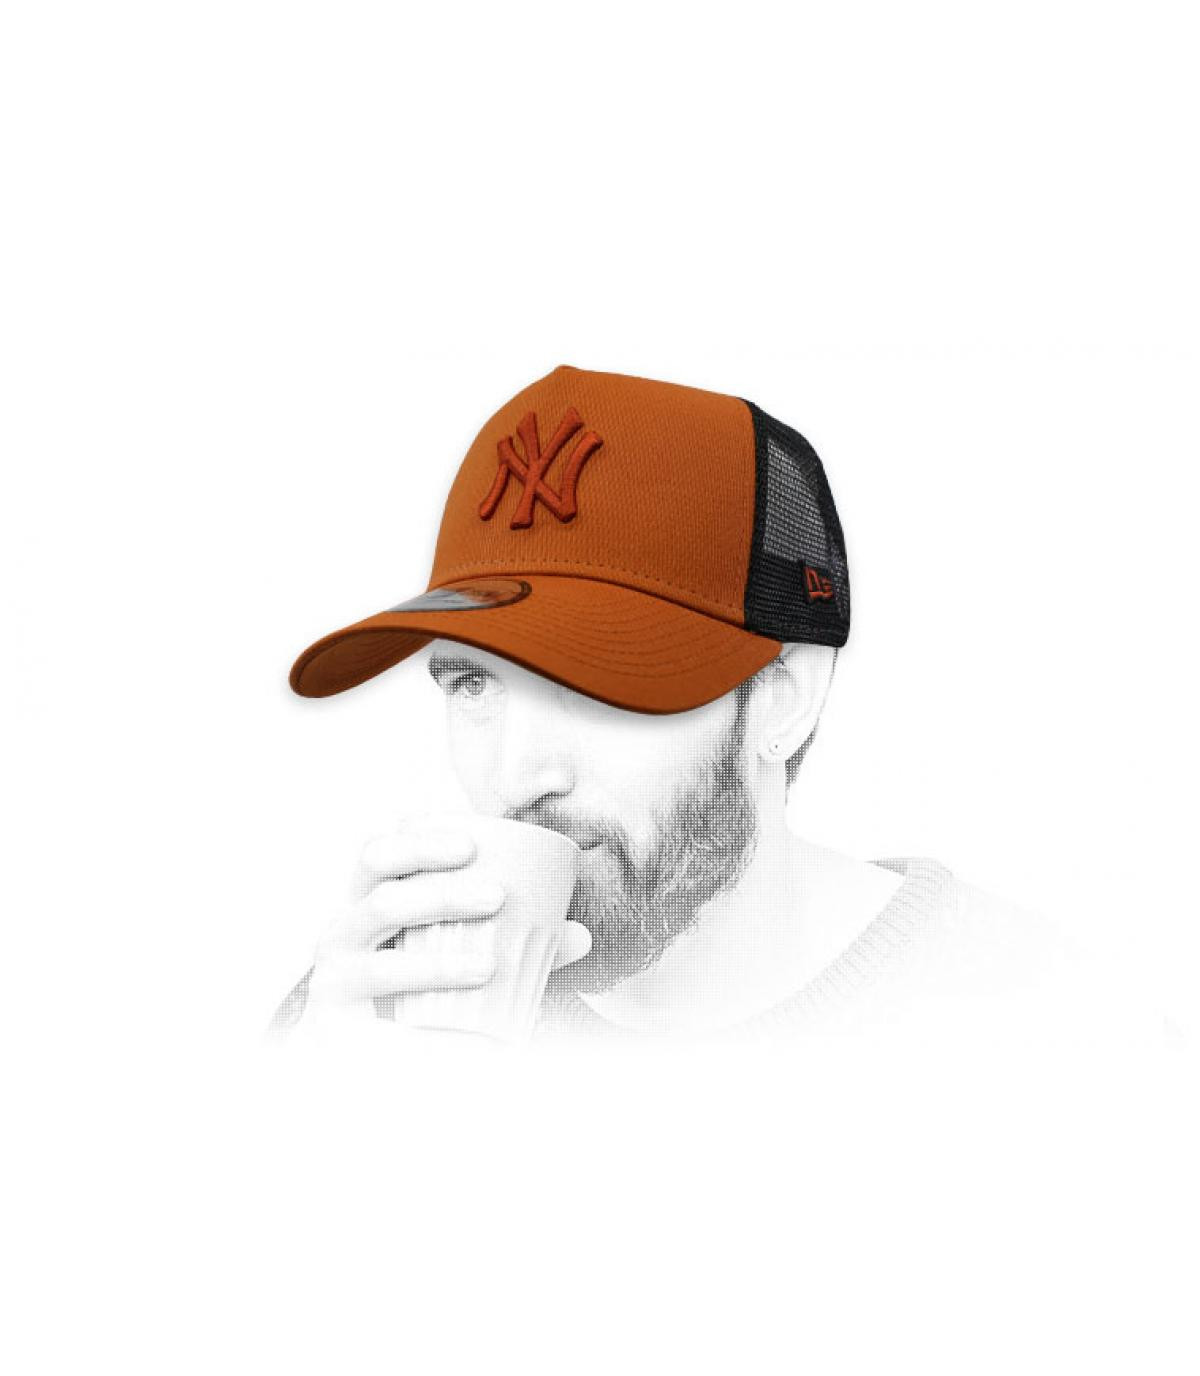 black brown NY trucker